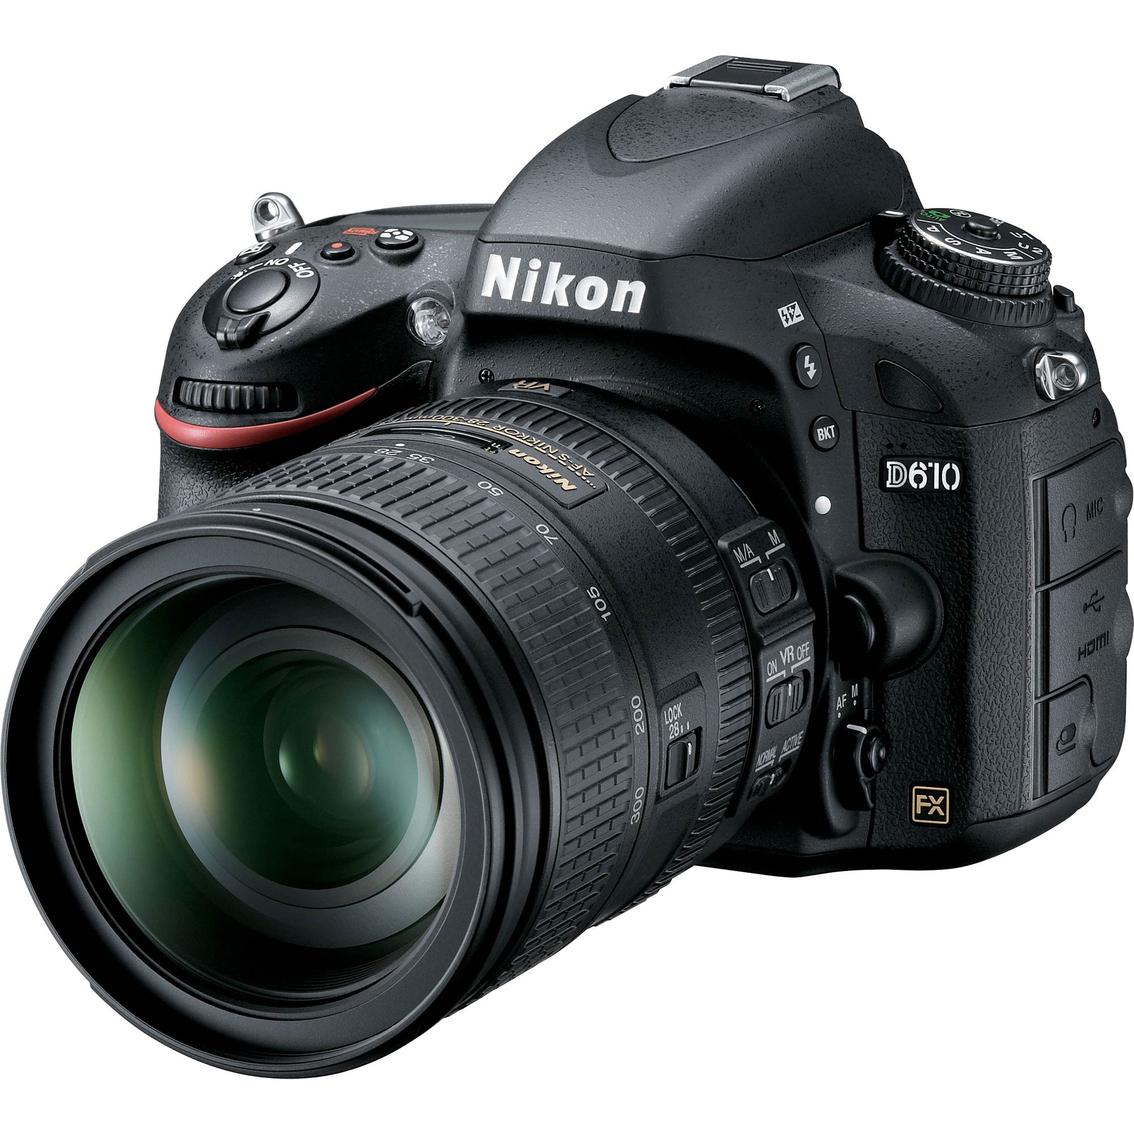 Camera Hd Dslr Cameras nikon d610 24 13mp hd dslr camera with 28 300mm vr lens lens